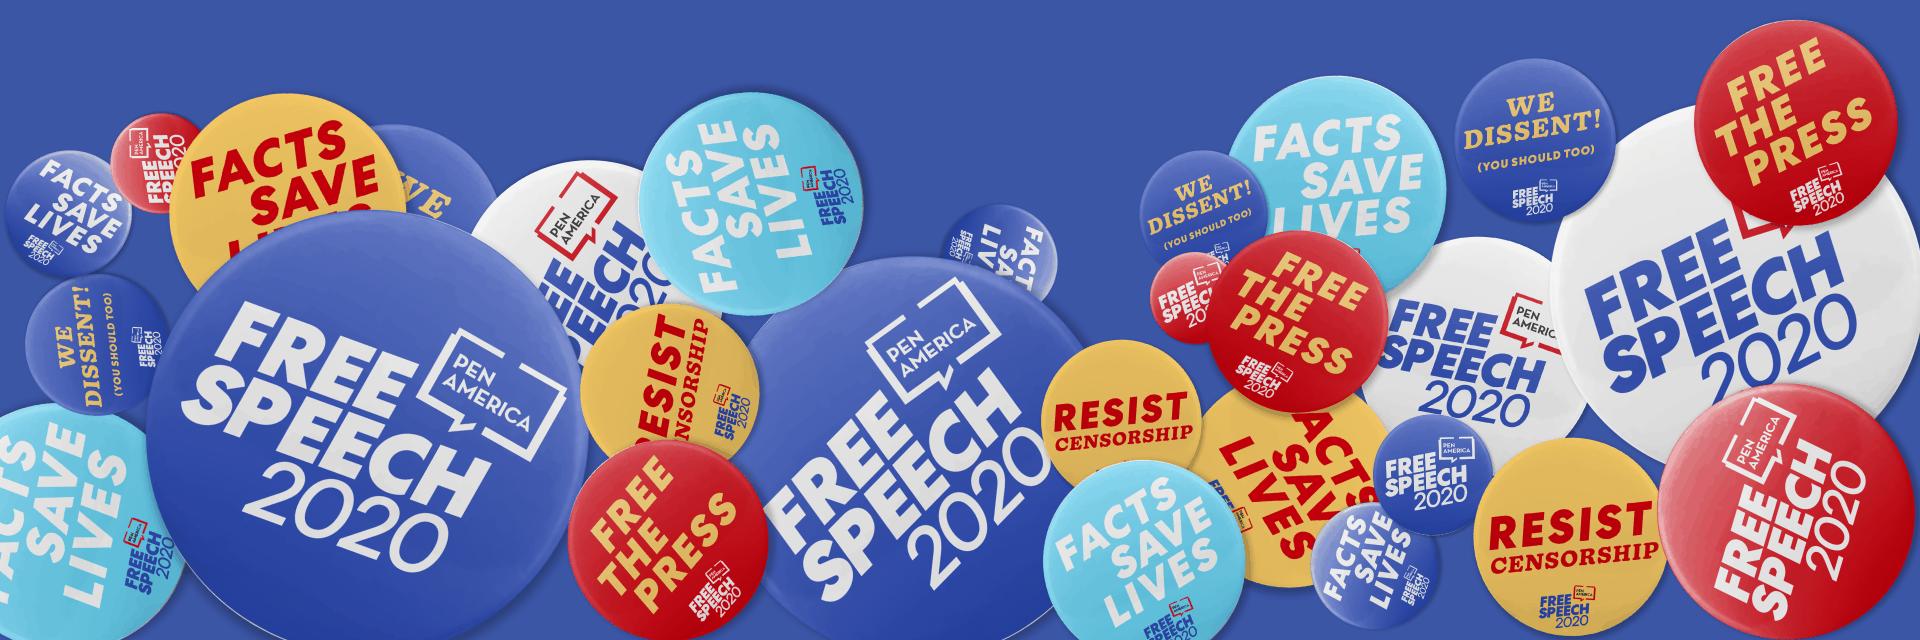 Free Speech 2020 Homepage Slider Image